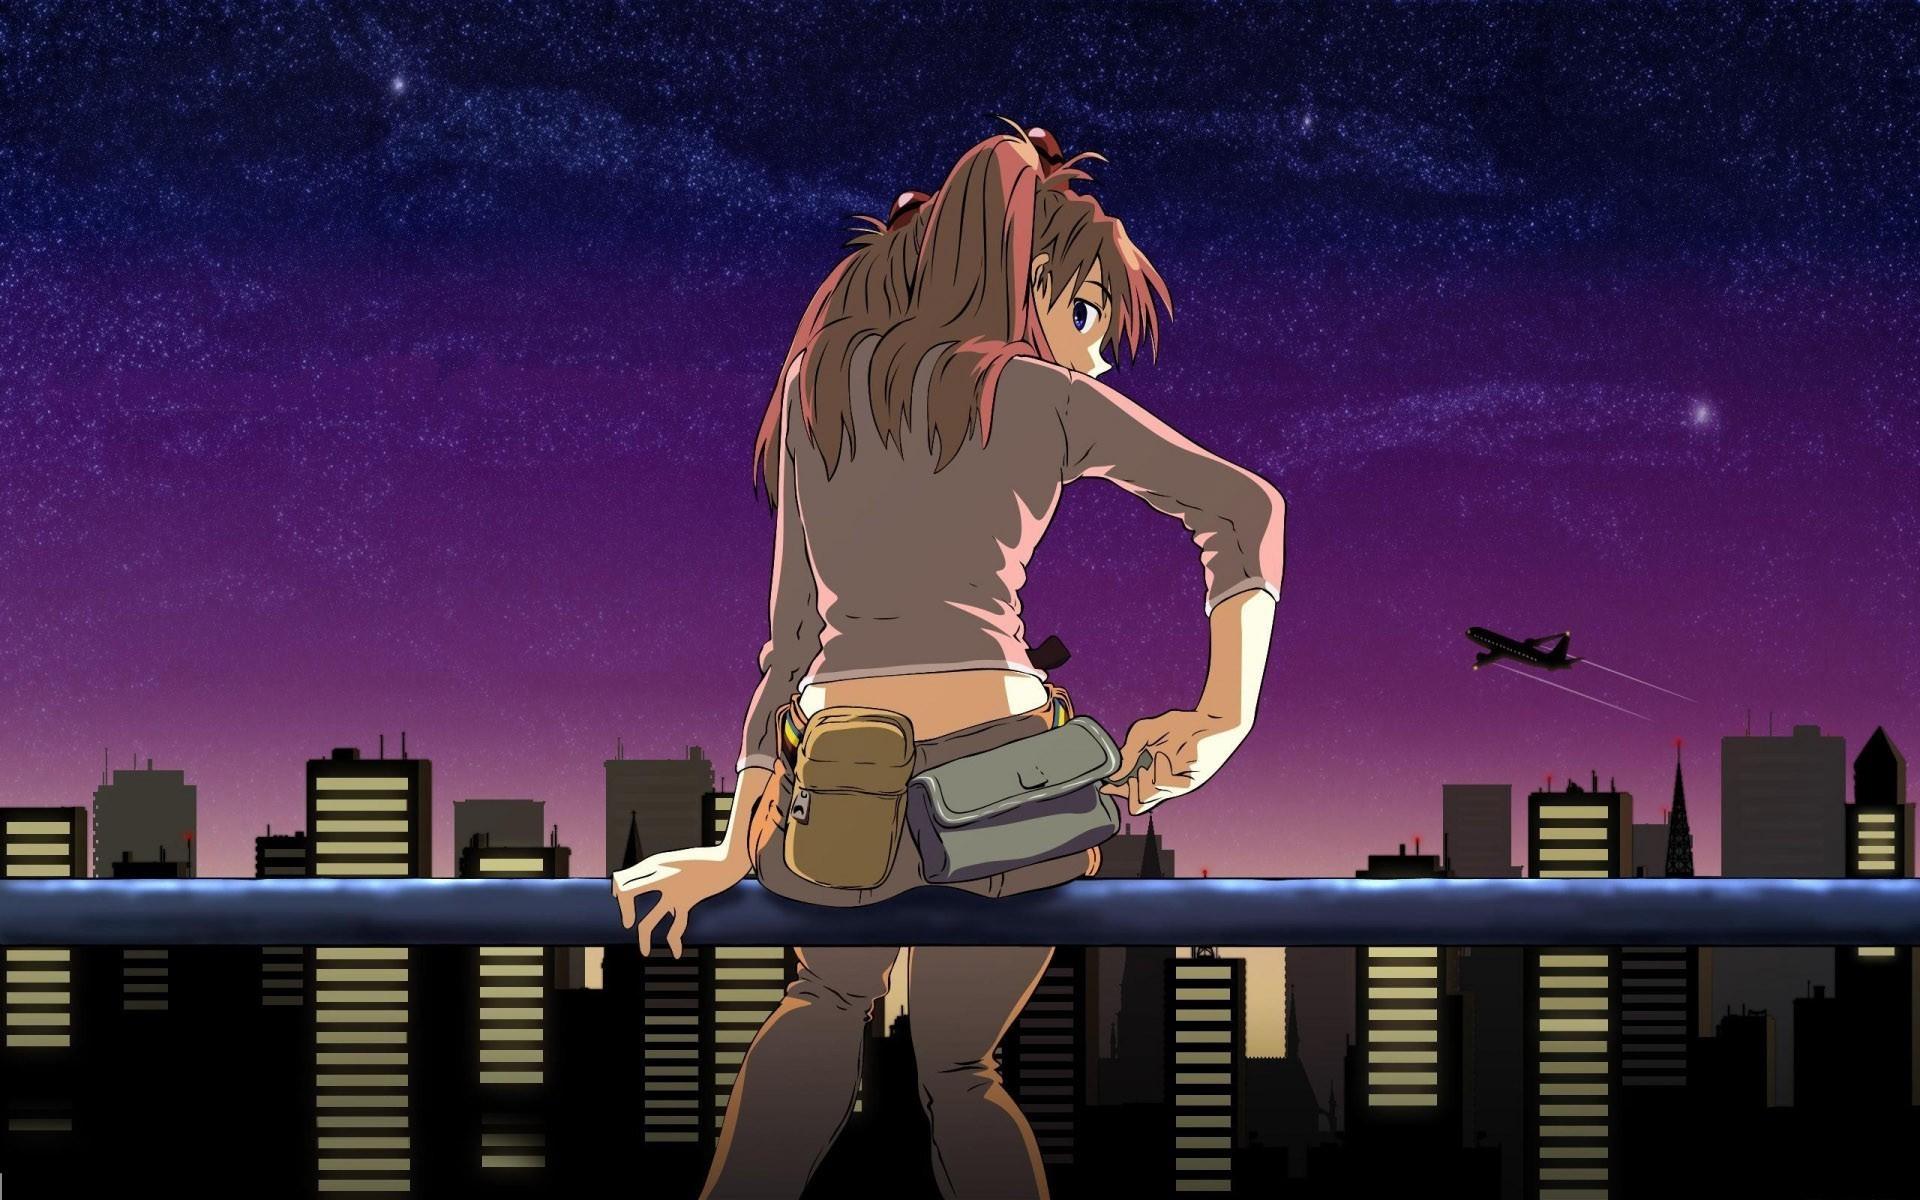 PreviousNext. Previous Image Next Image. anime wallpapers asuka langley  soryu neon genesis evangelion